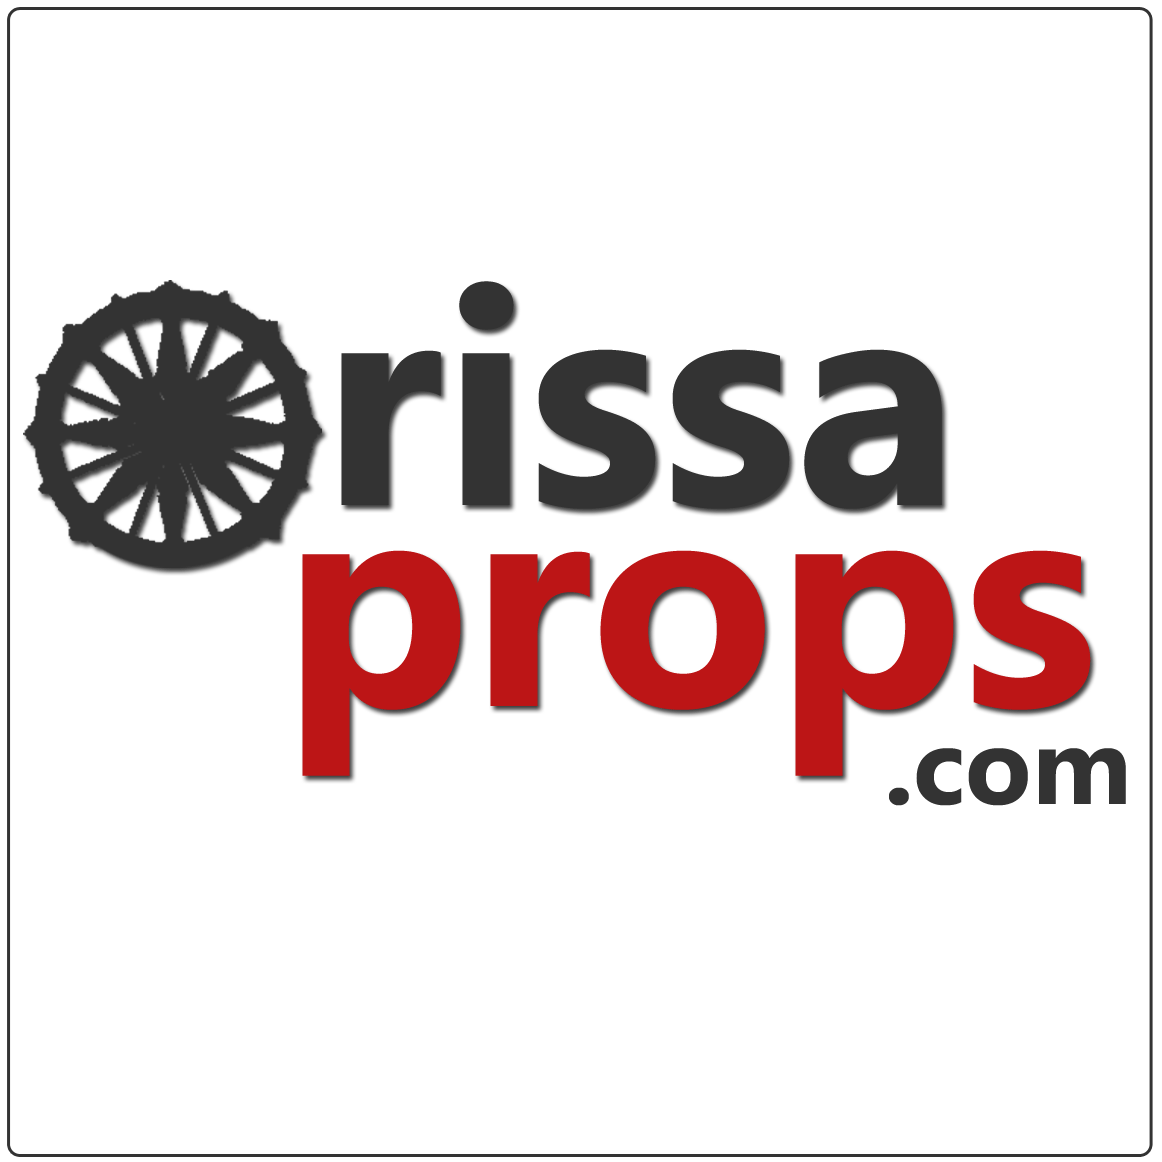 Orissa Props (oprops) on Pinterest